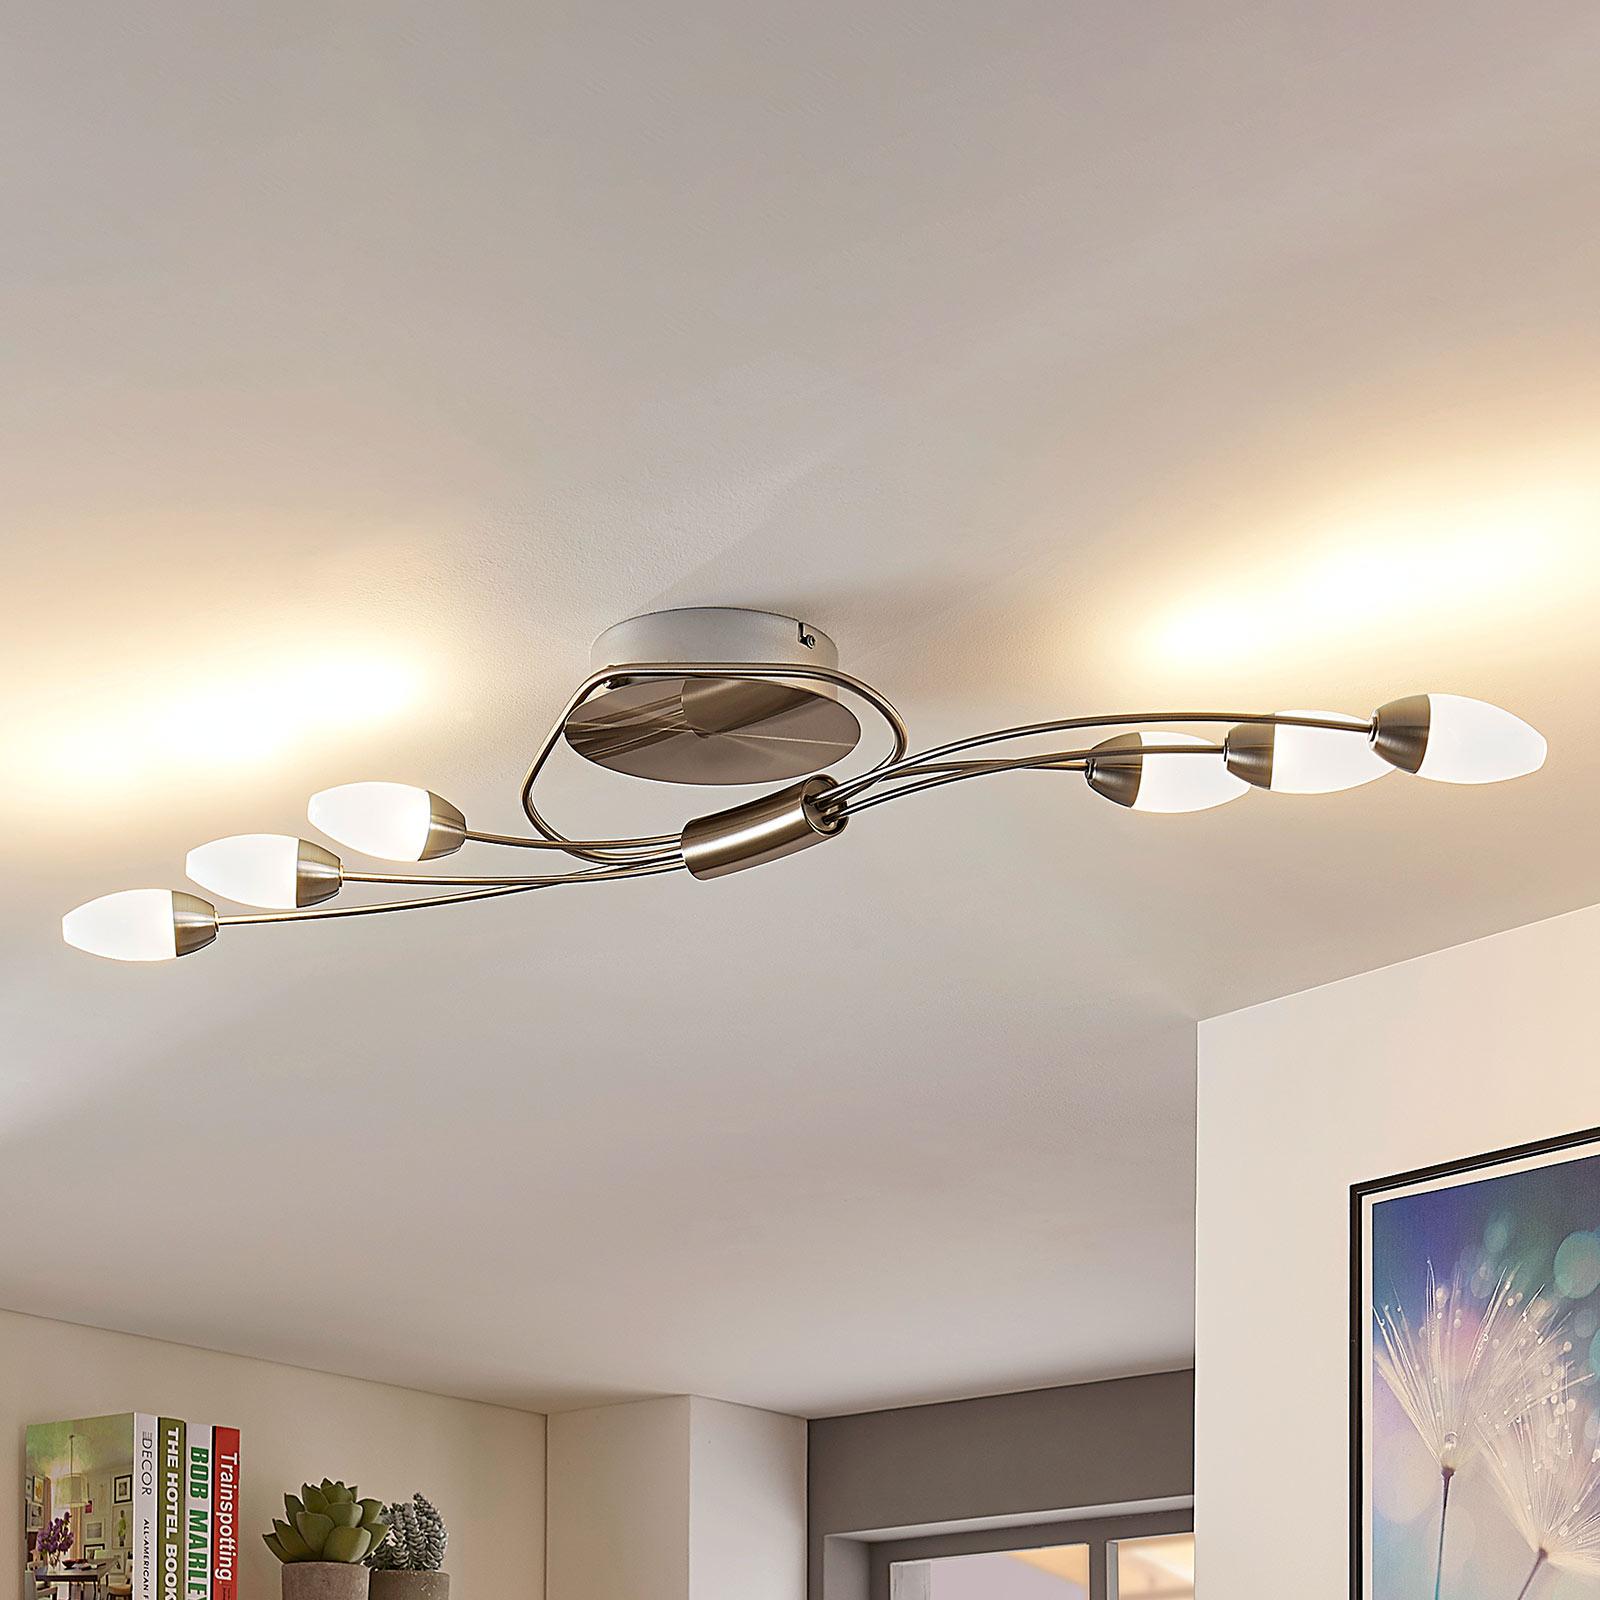 LED-Deckenleuchte Deyan, dimmbar, 6-fl., länglich